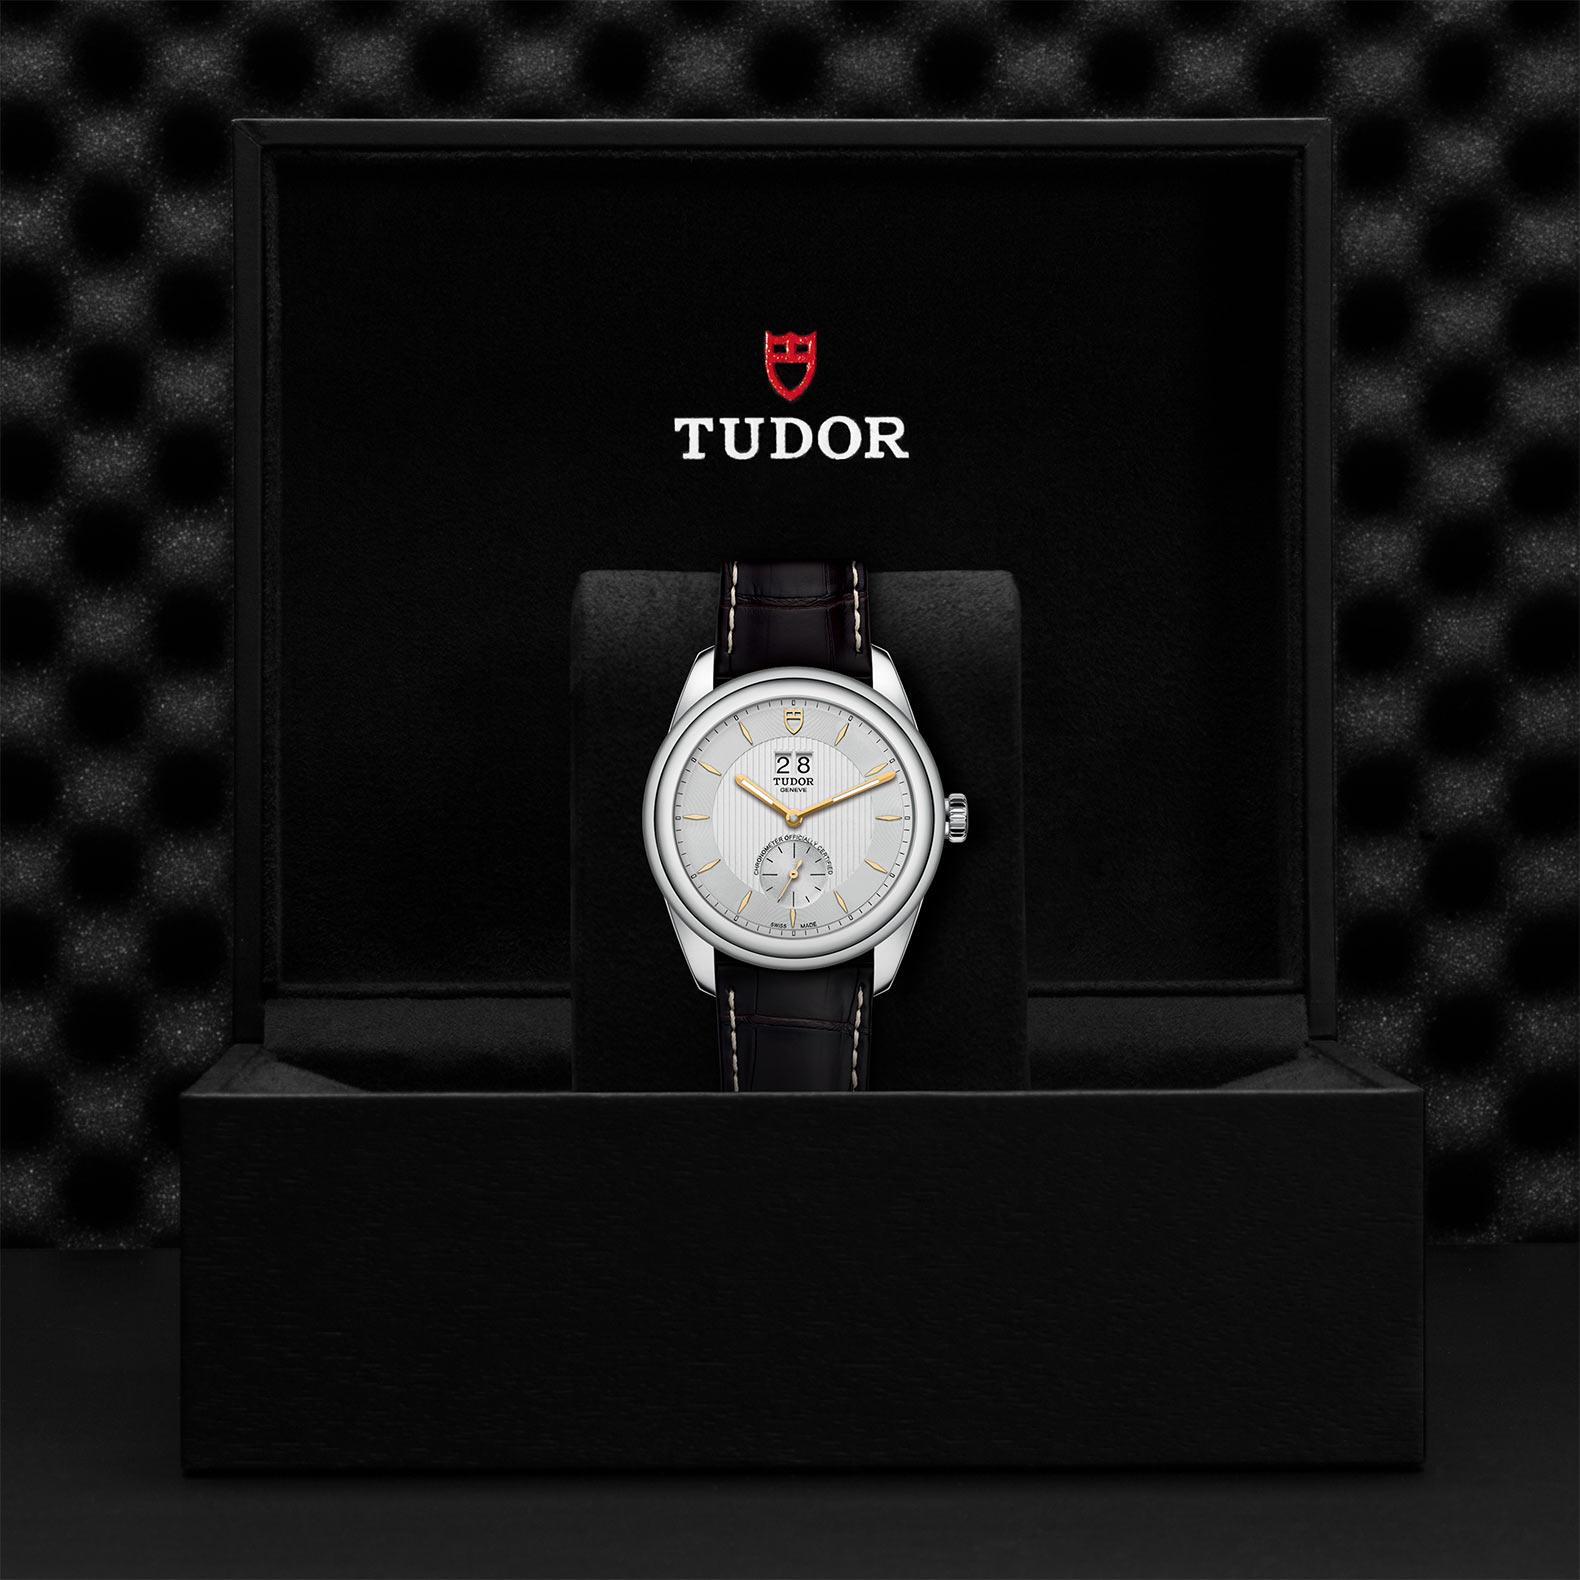 TUDOR Glamour Double Date M57100 0017 Presentationbox